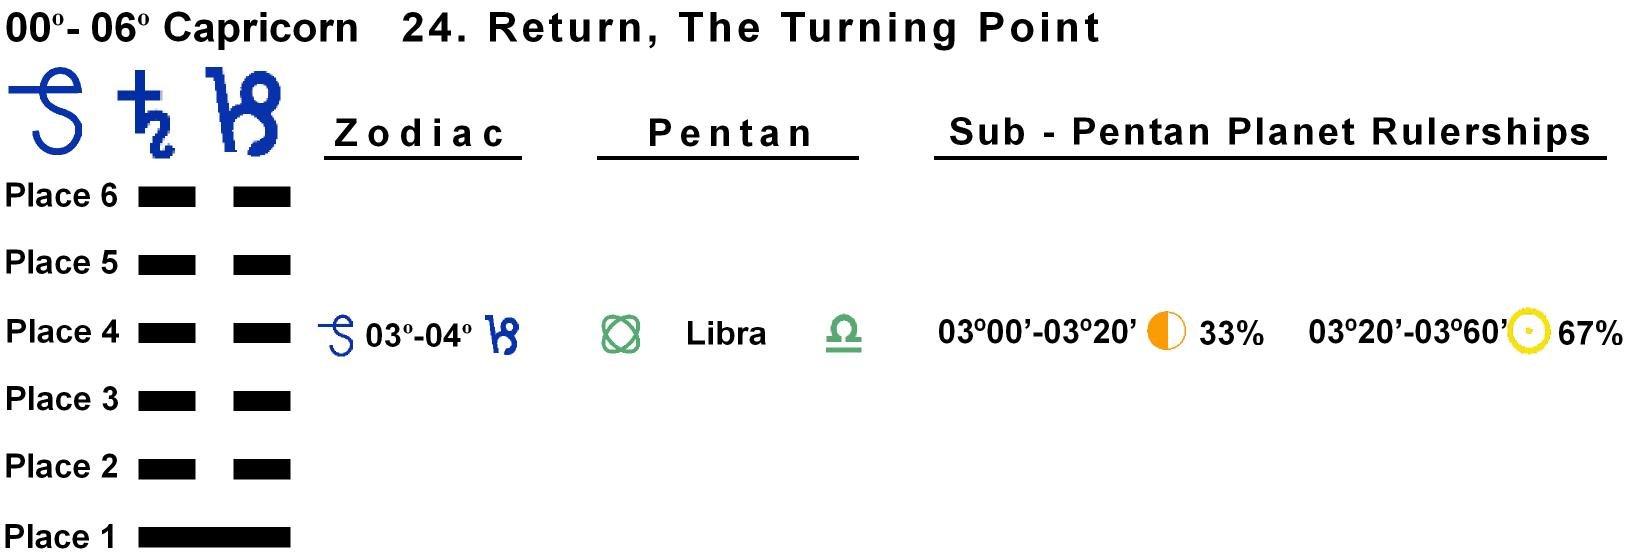 Pent-lines-10CP 03-04 Hx-24 Return